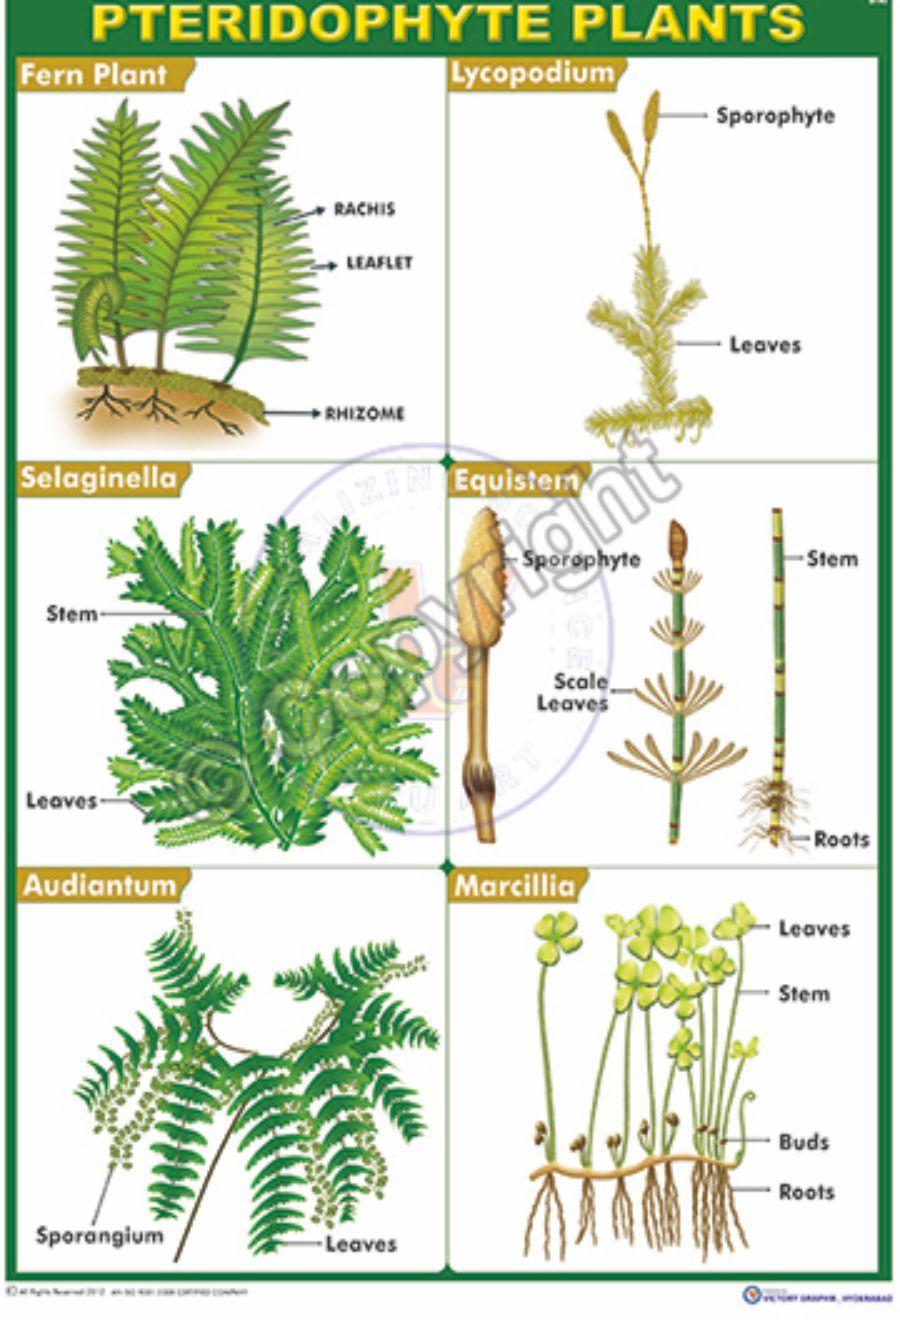 B90 Pteridophyta plants Example Plants, Plant leaves